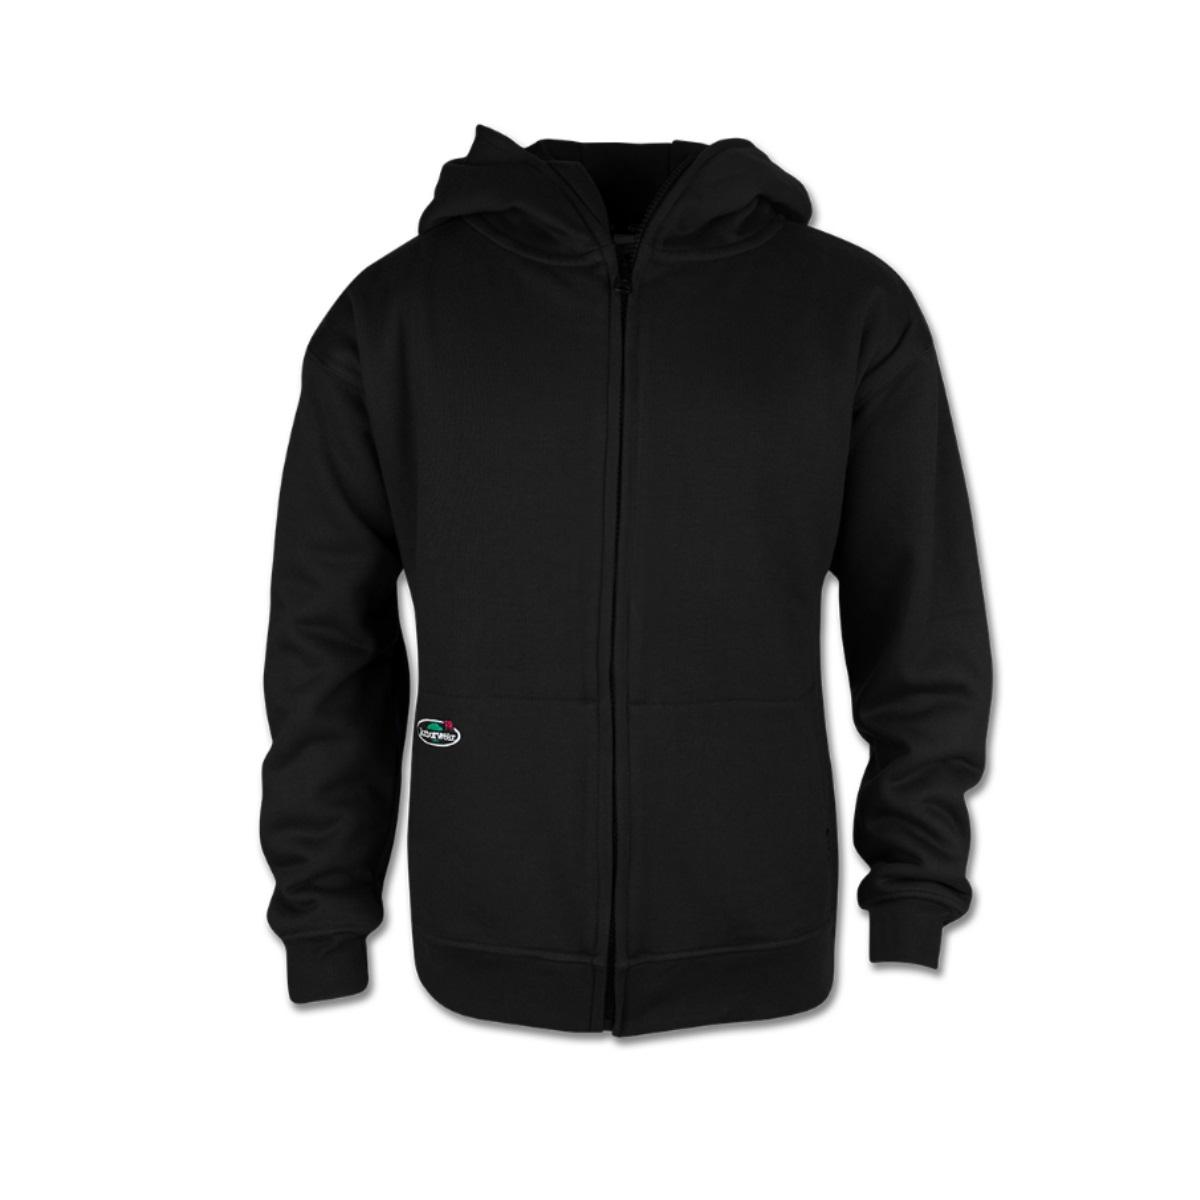 Arborwear Flame Resistant Thick Full Zip Sweatshirt